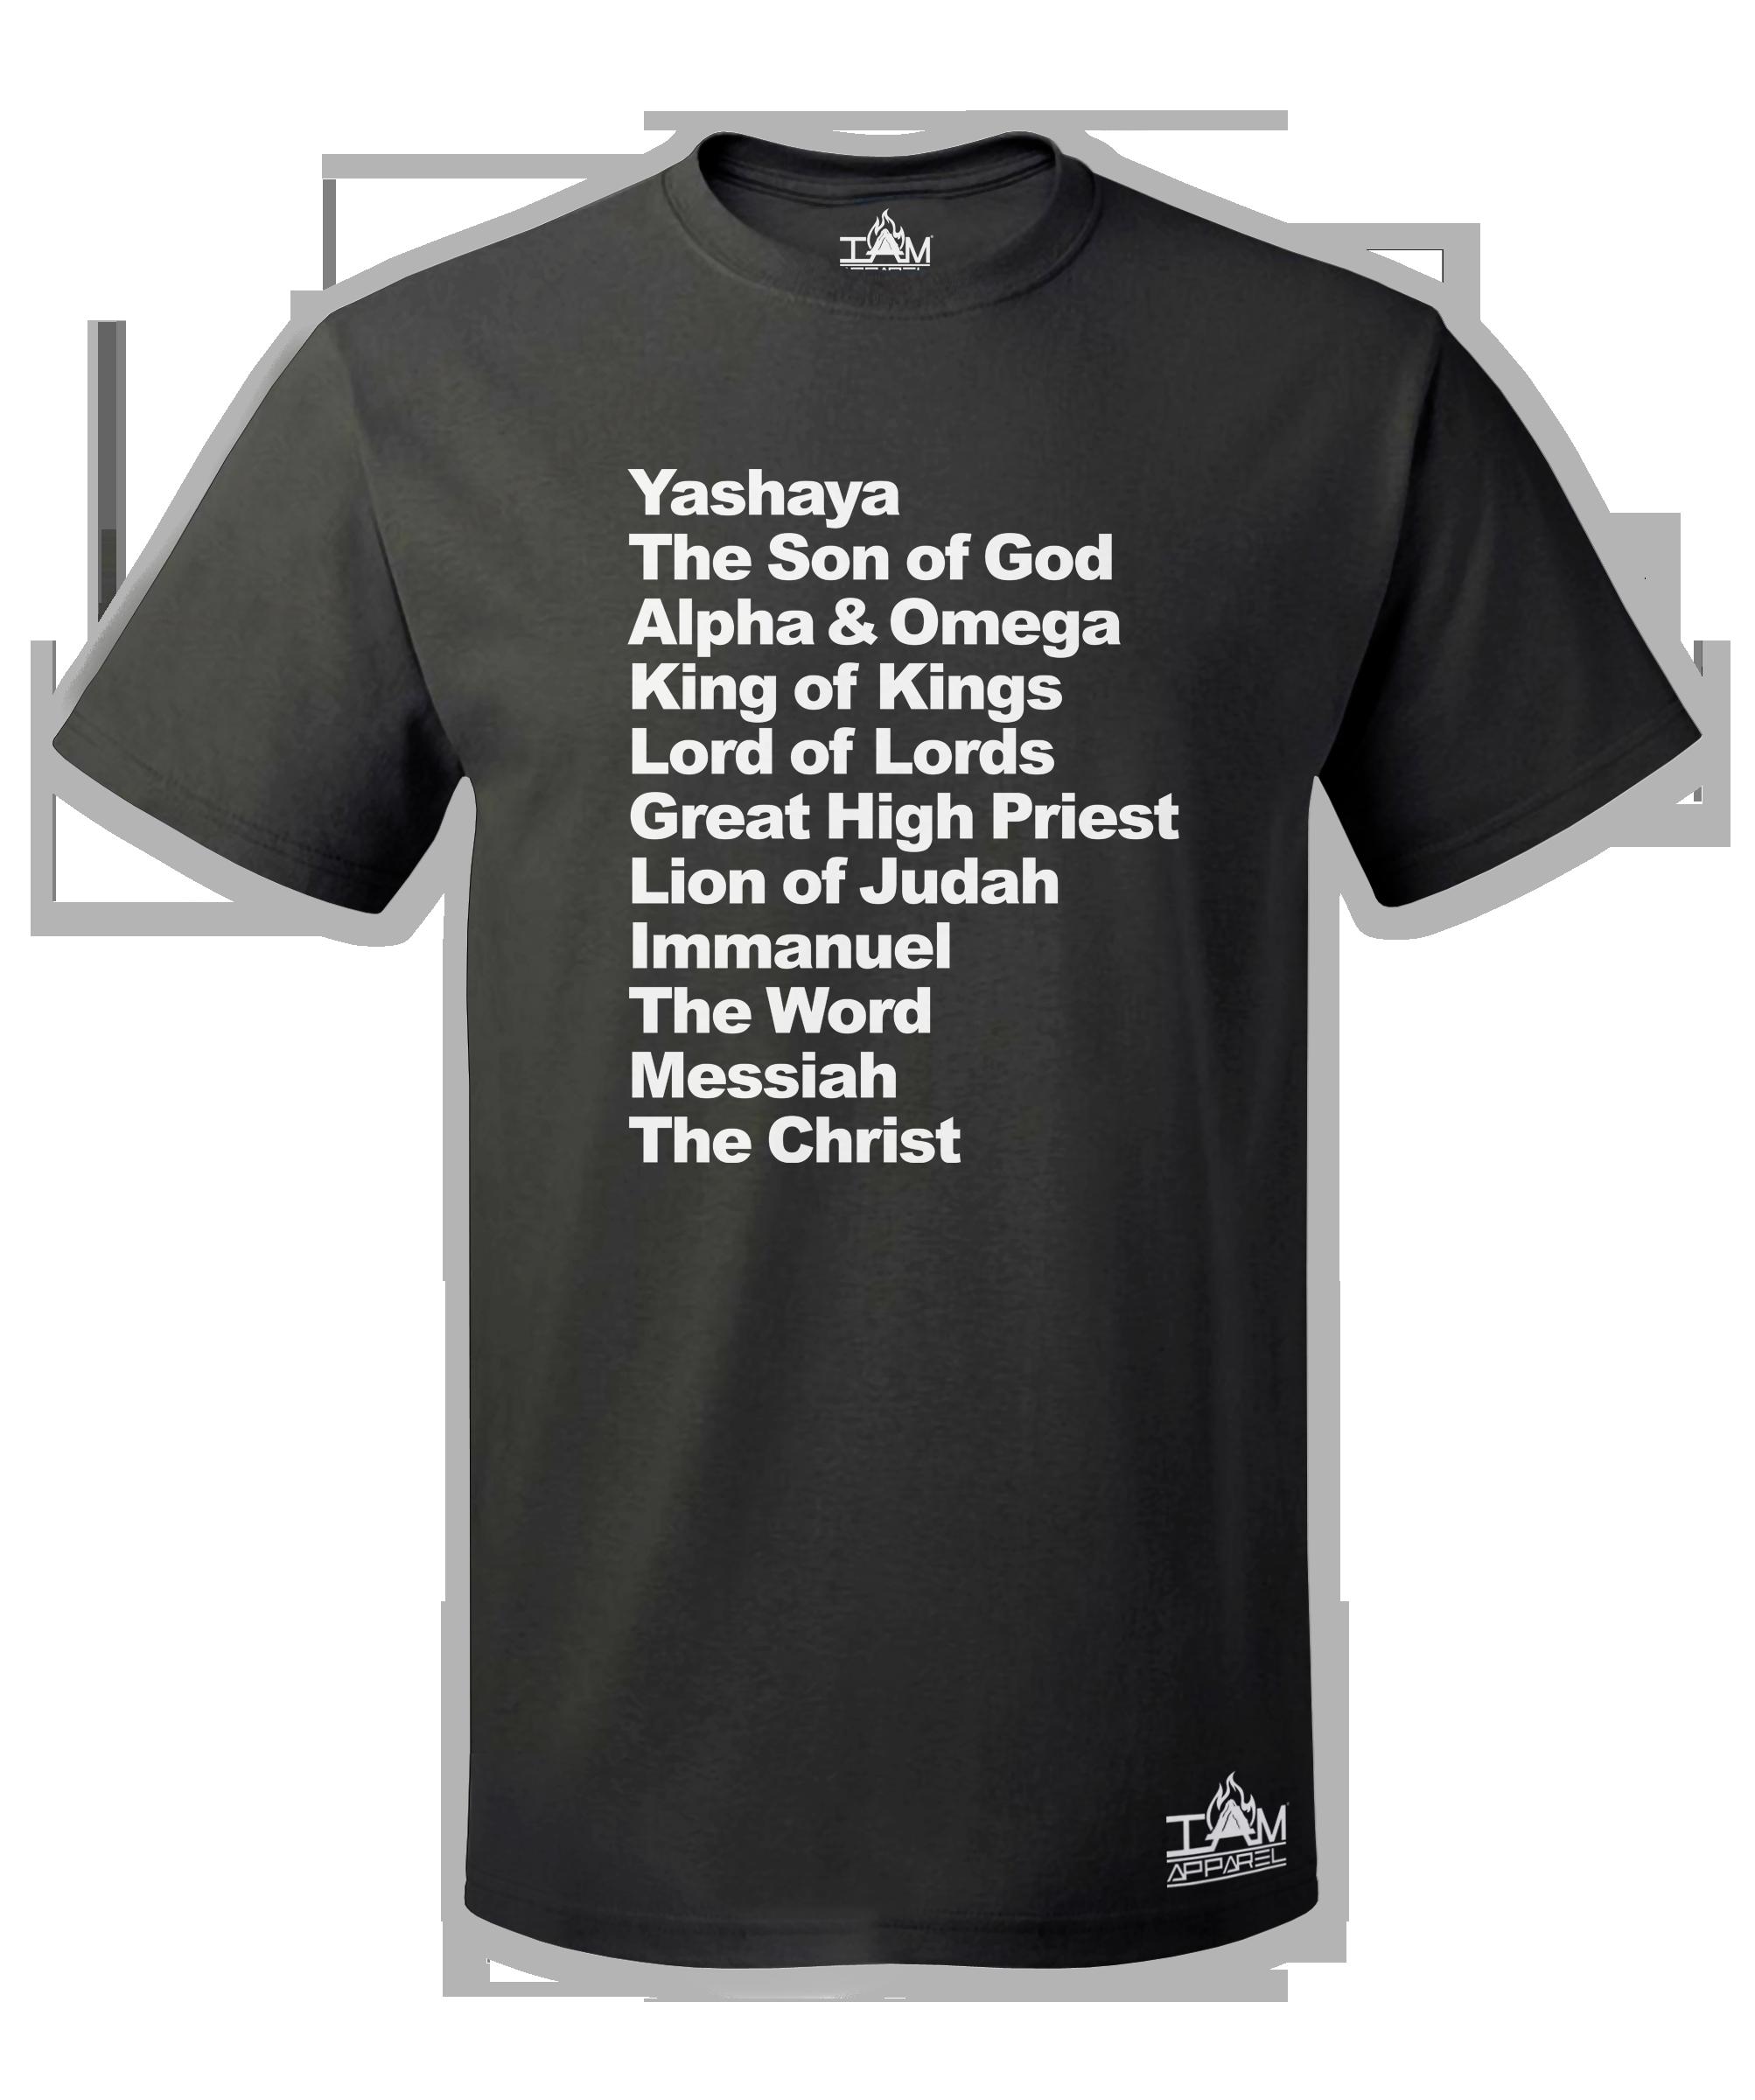 Men's Yashaya Text Short Sleeved T-shirt